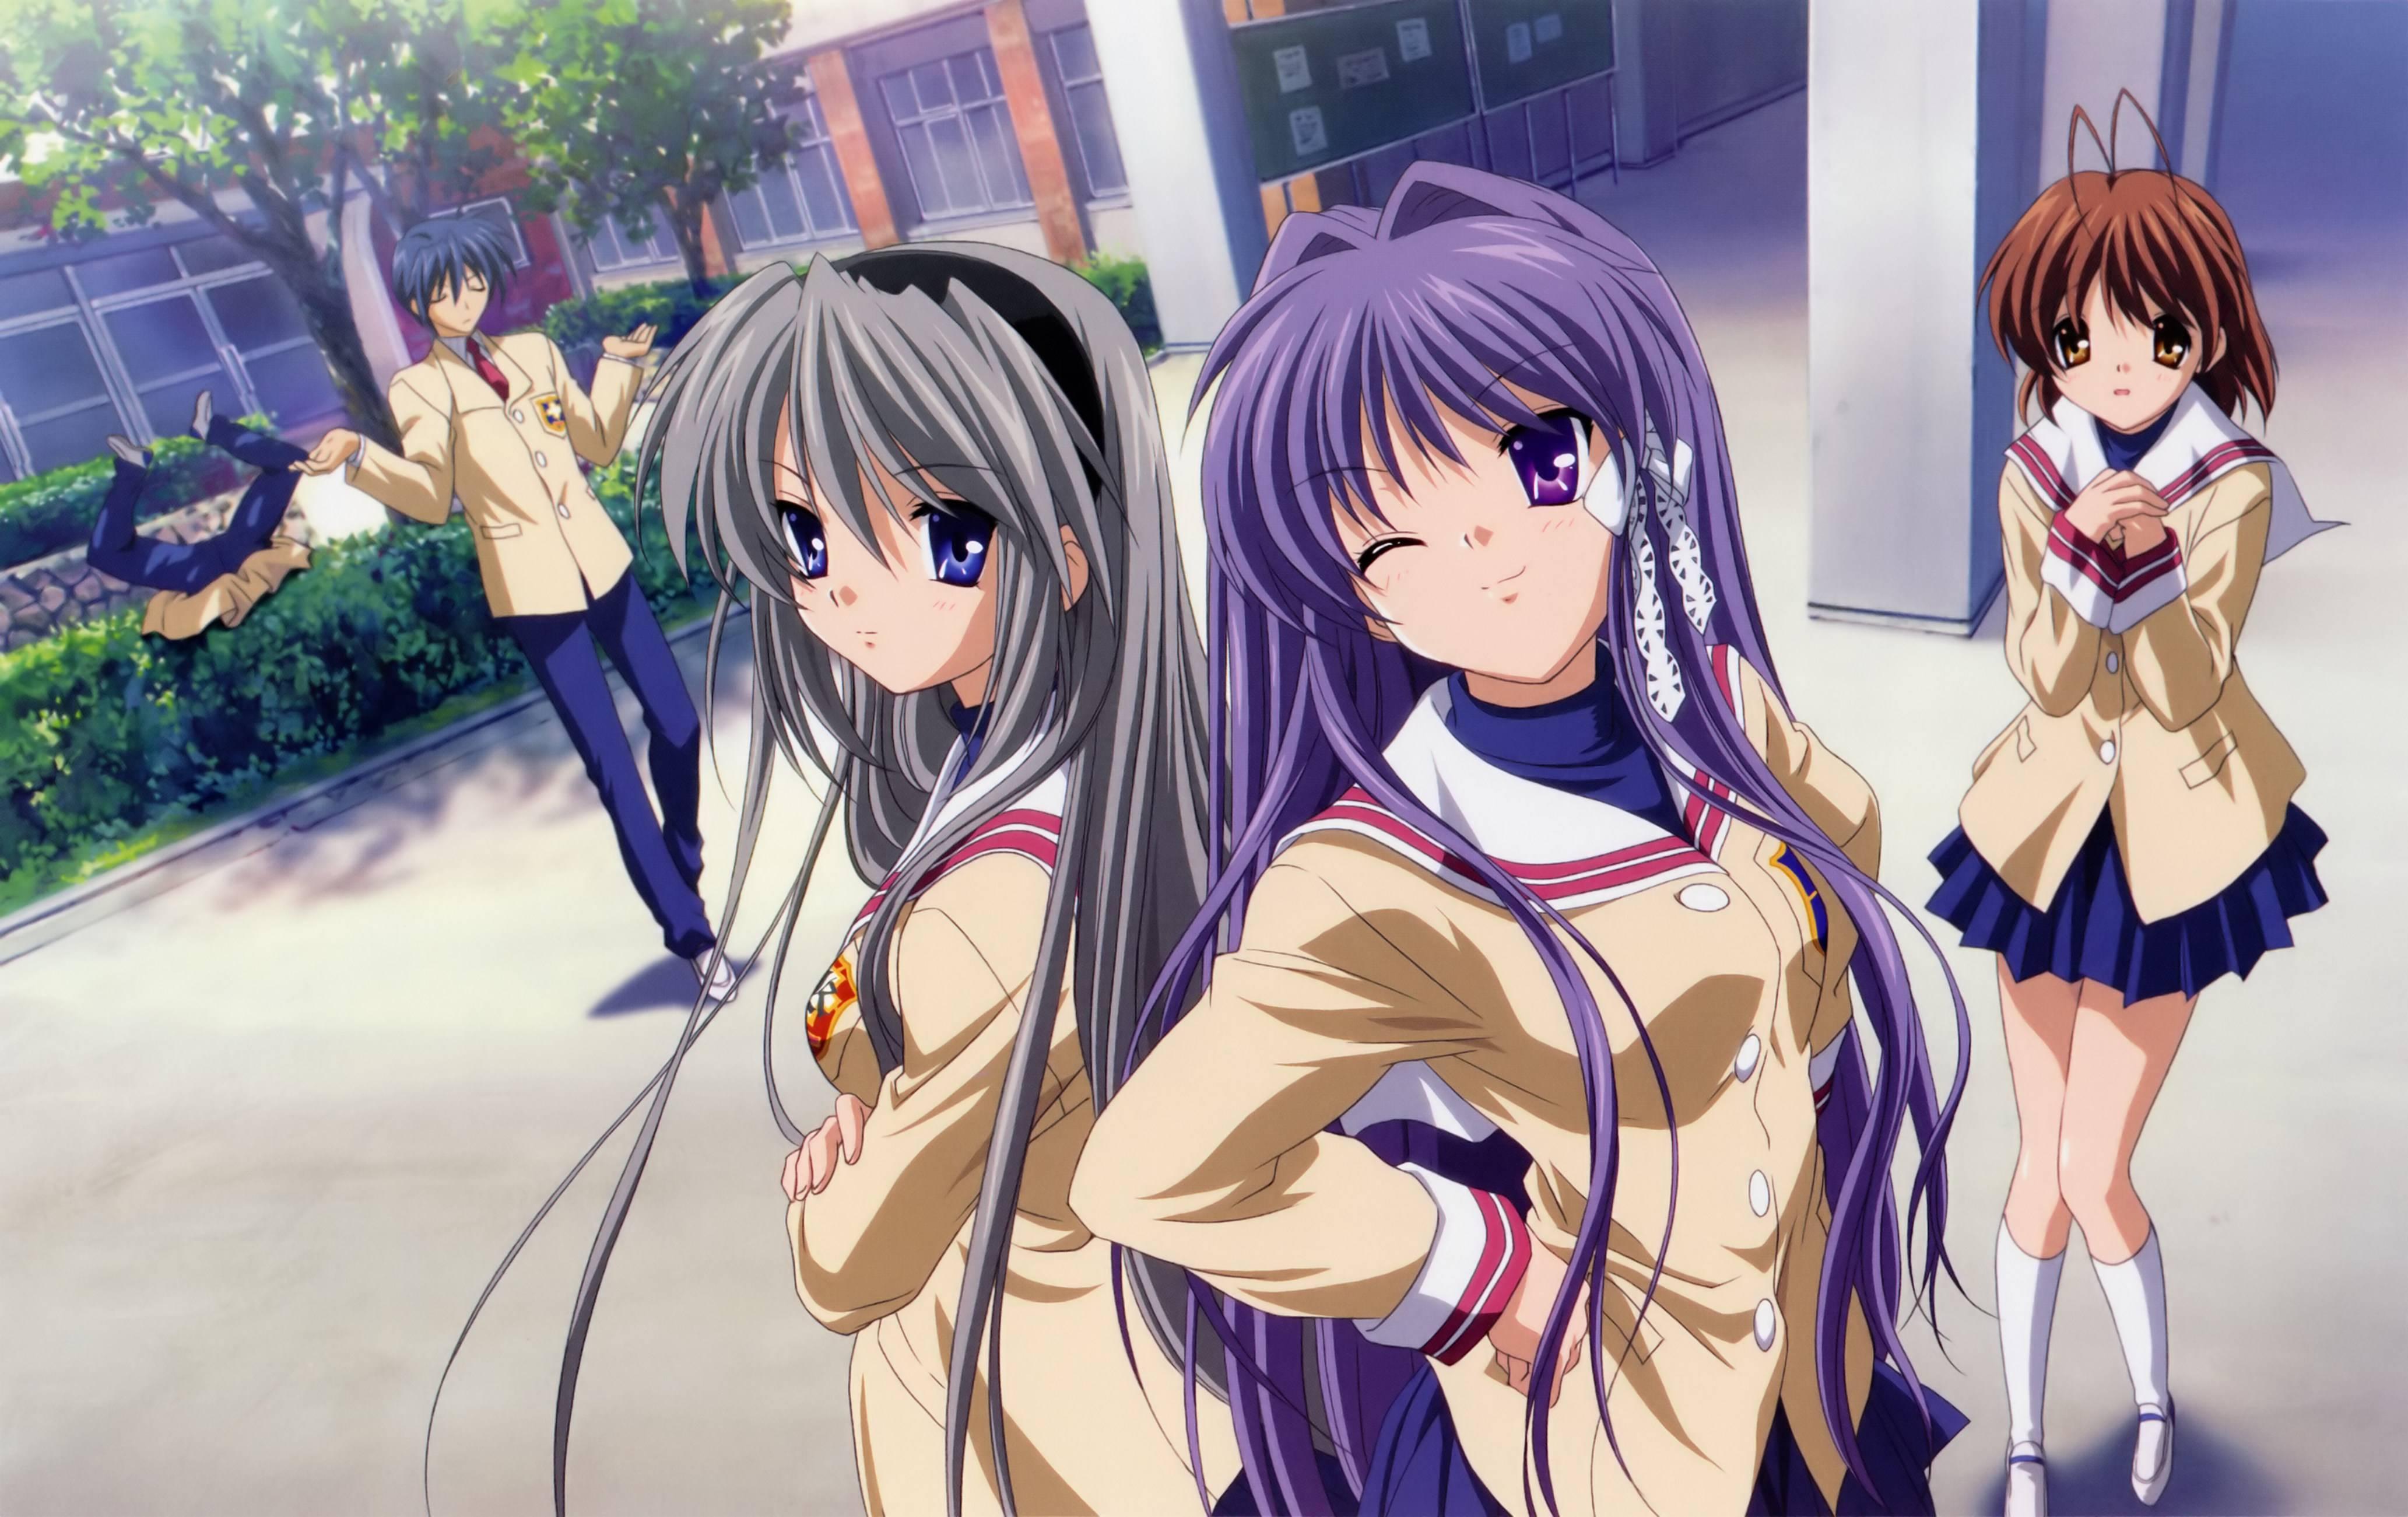 Depressing Saddest anime about school life, Clannad